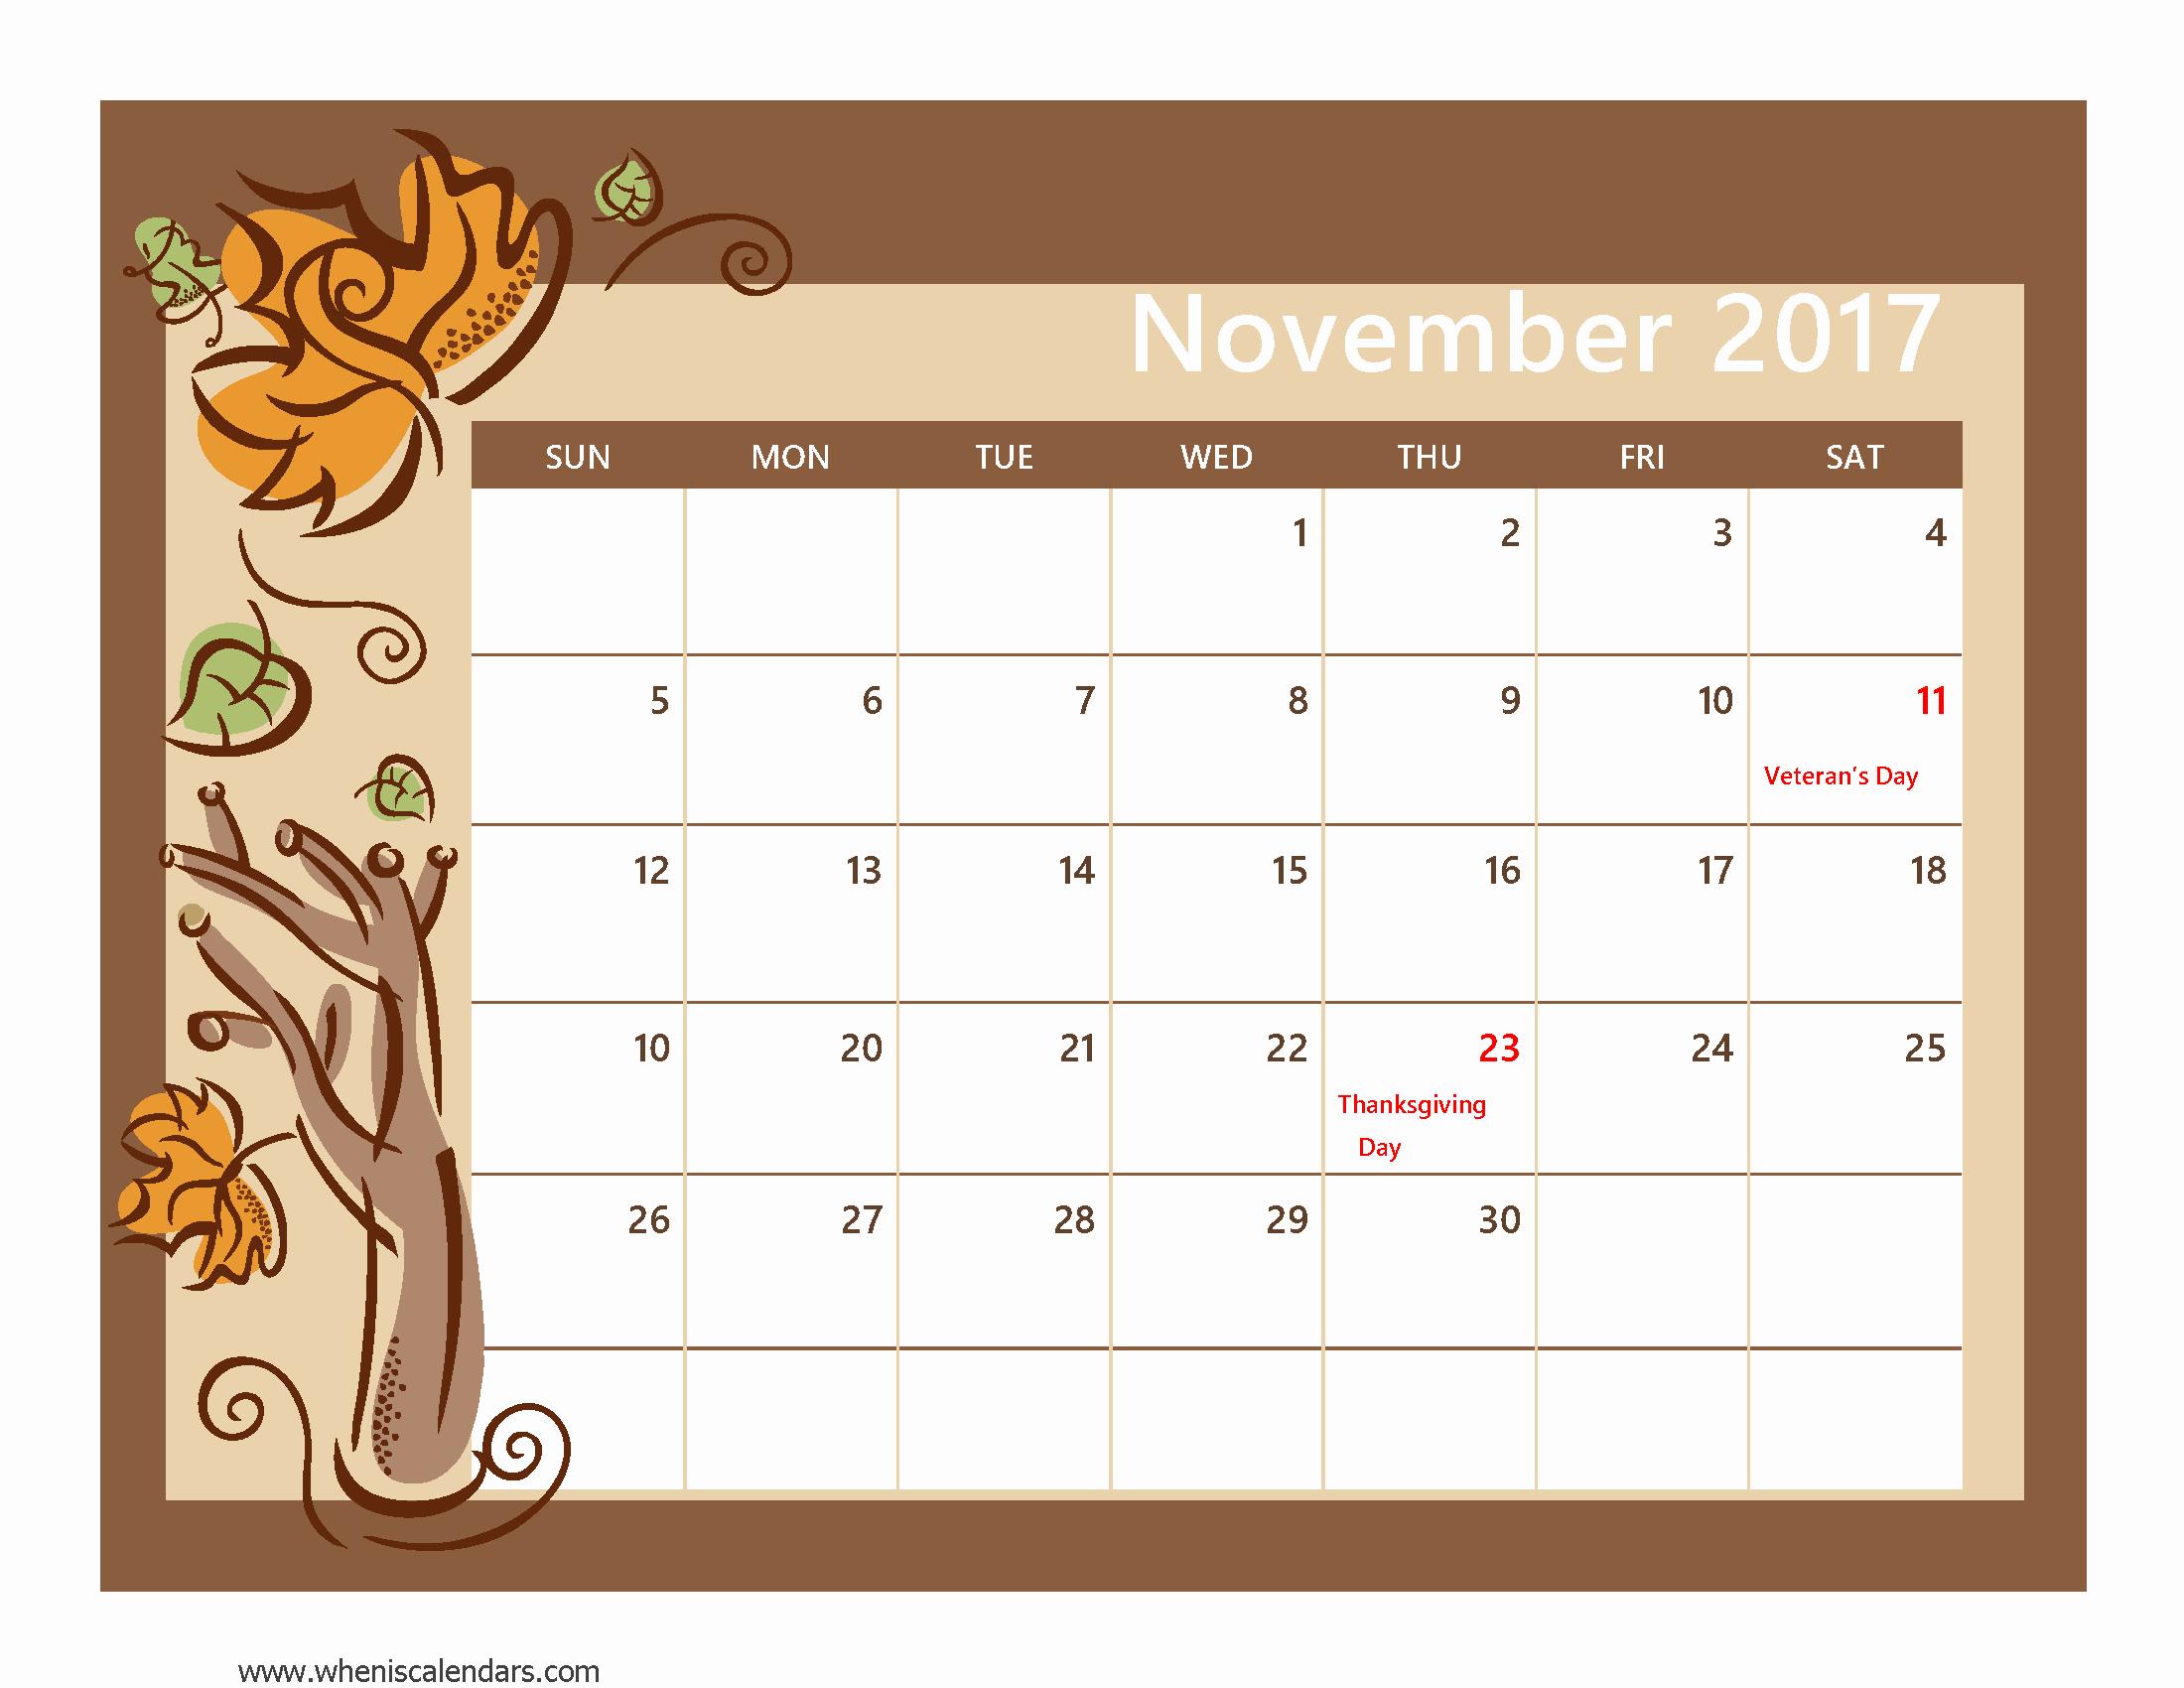 2017 Editable Calendar with Holidays Best Of November 2017 Calendar Printable with Holidays